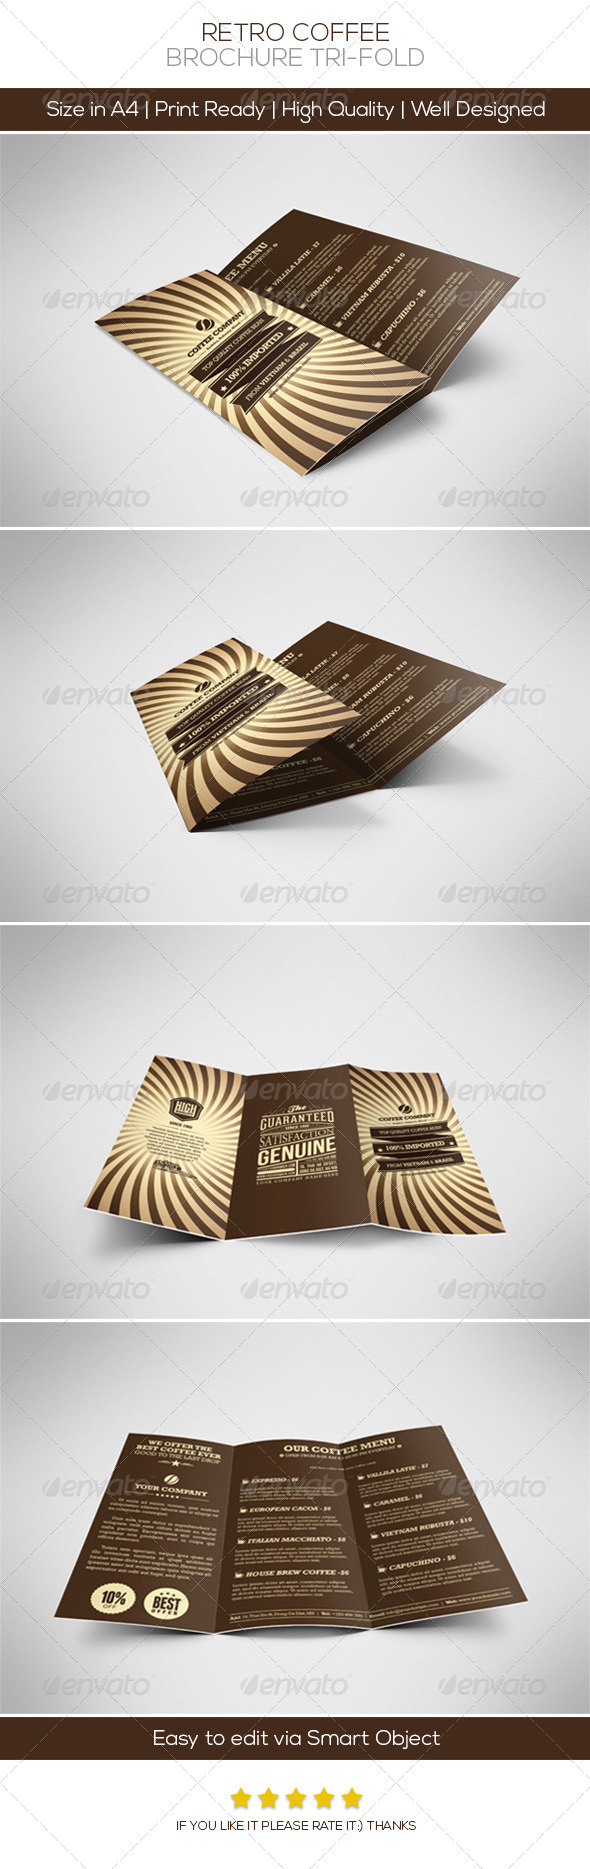 Retro Coffee Brochure Tri-fold - Brochures Print Templates